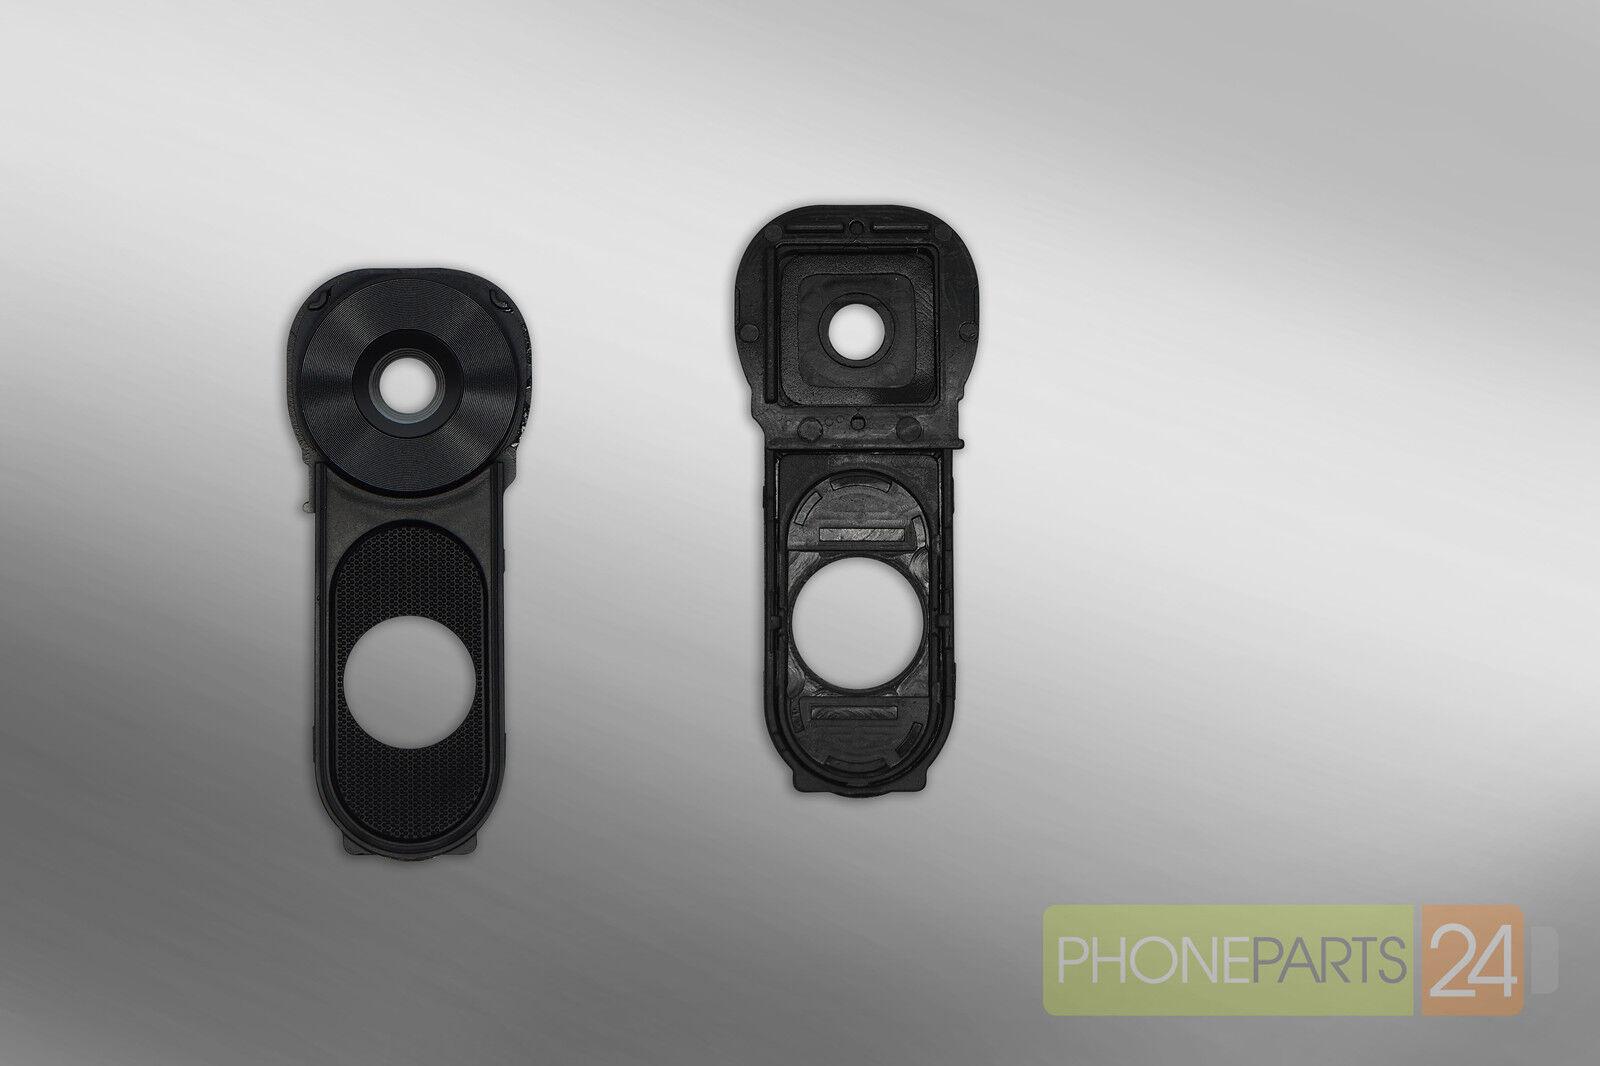 LG V10 Kamera Glas Linse Camera Glass Lens mit Rahmen/Frame Schwarz ...